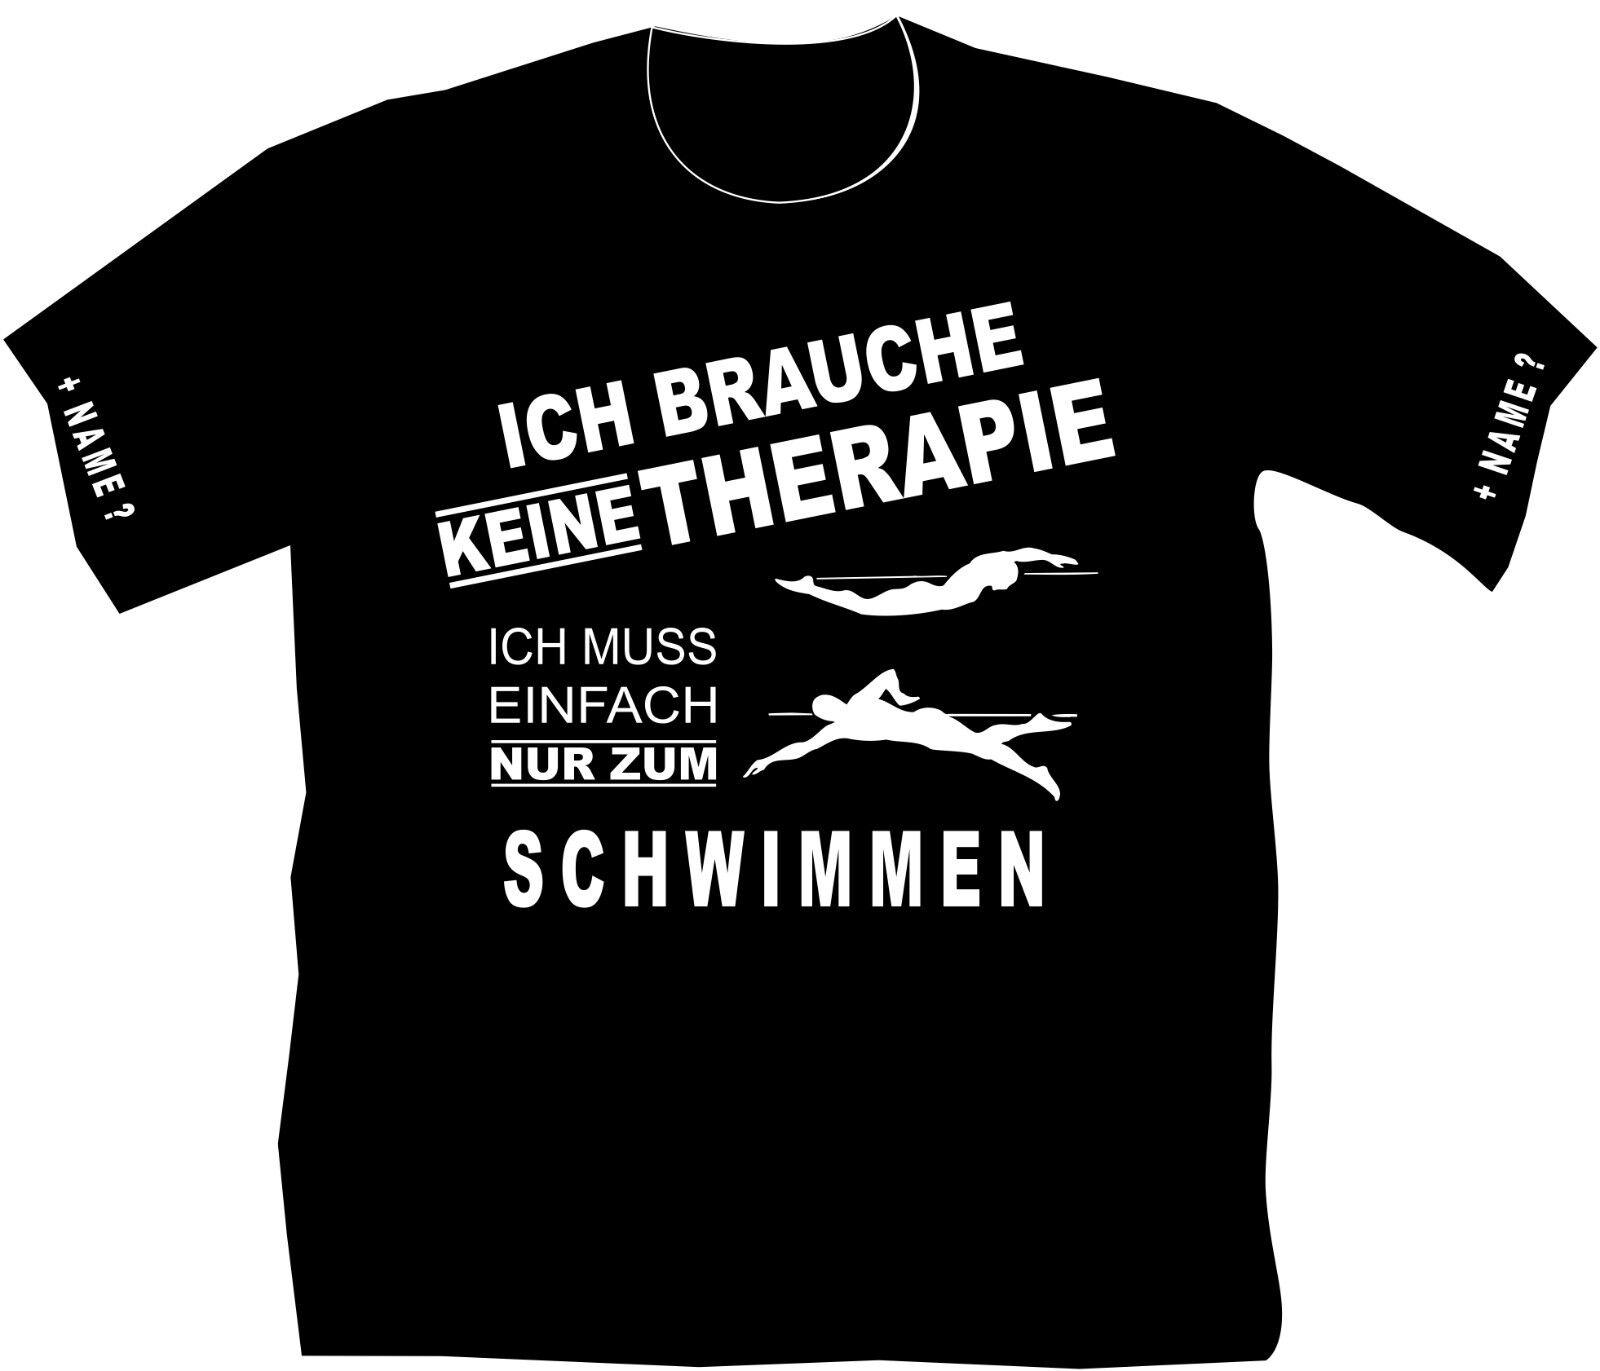 T-Shirt Schwimmen Schwimmsport Funshirt Training Kraulen Schmetterling Brust 20